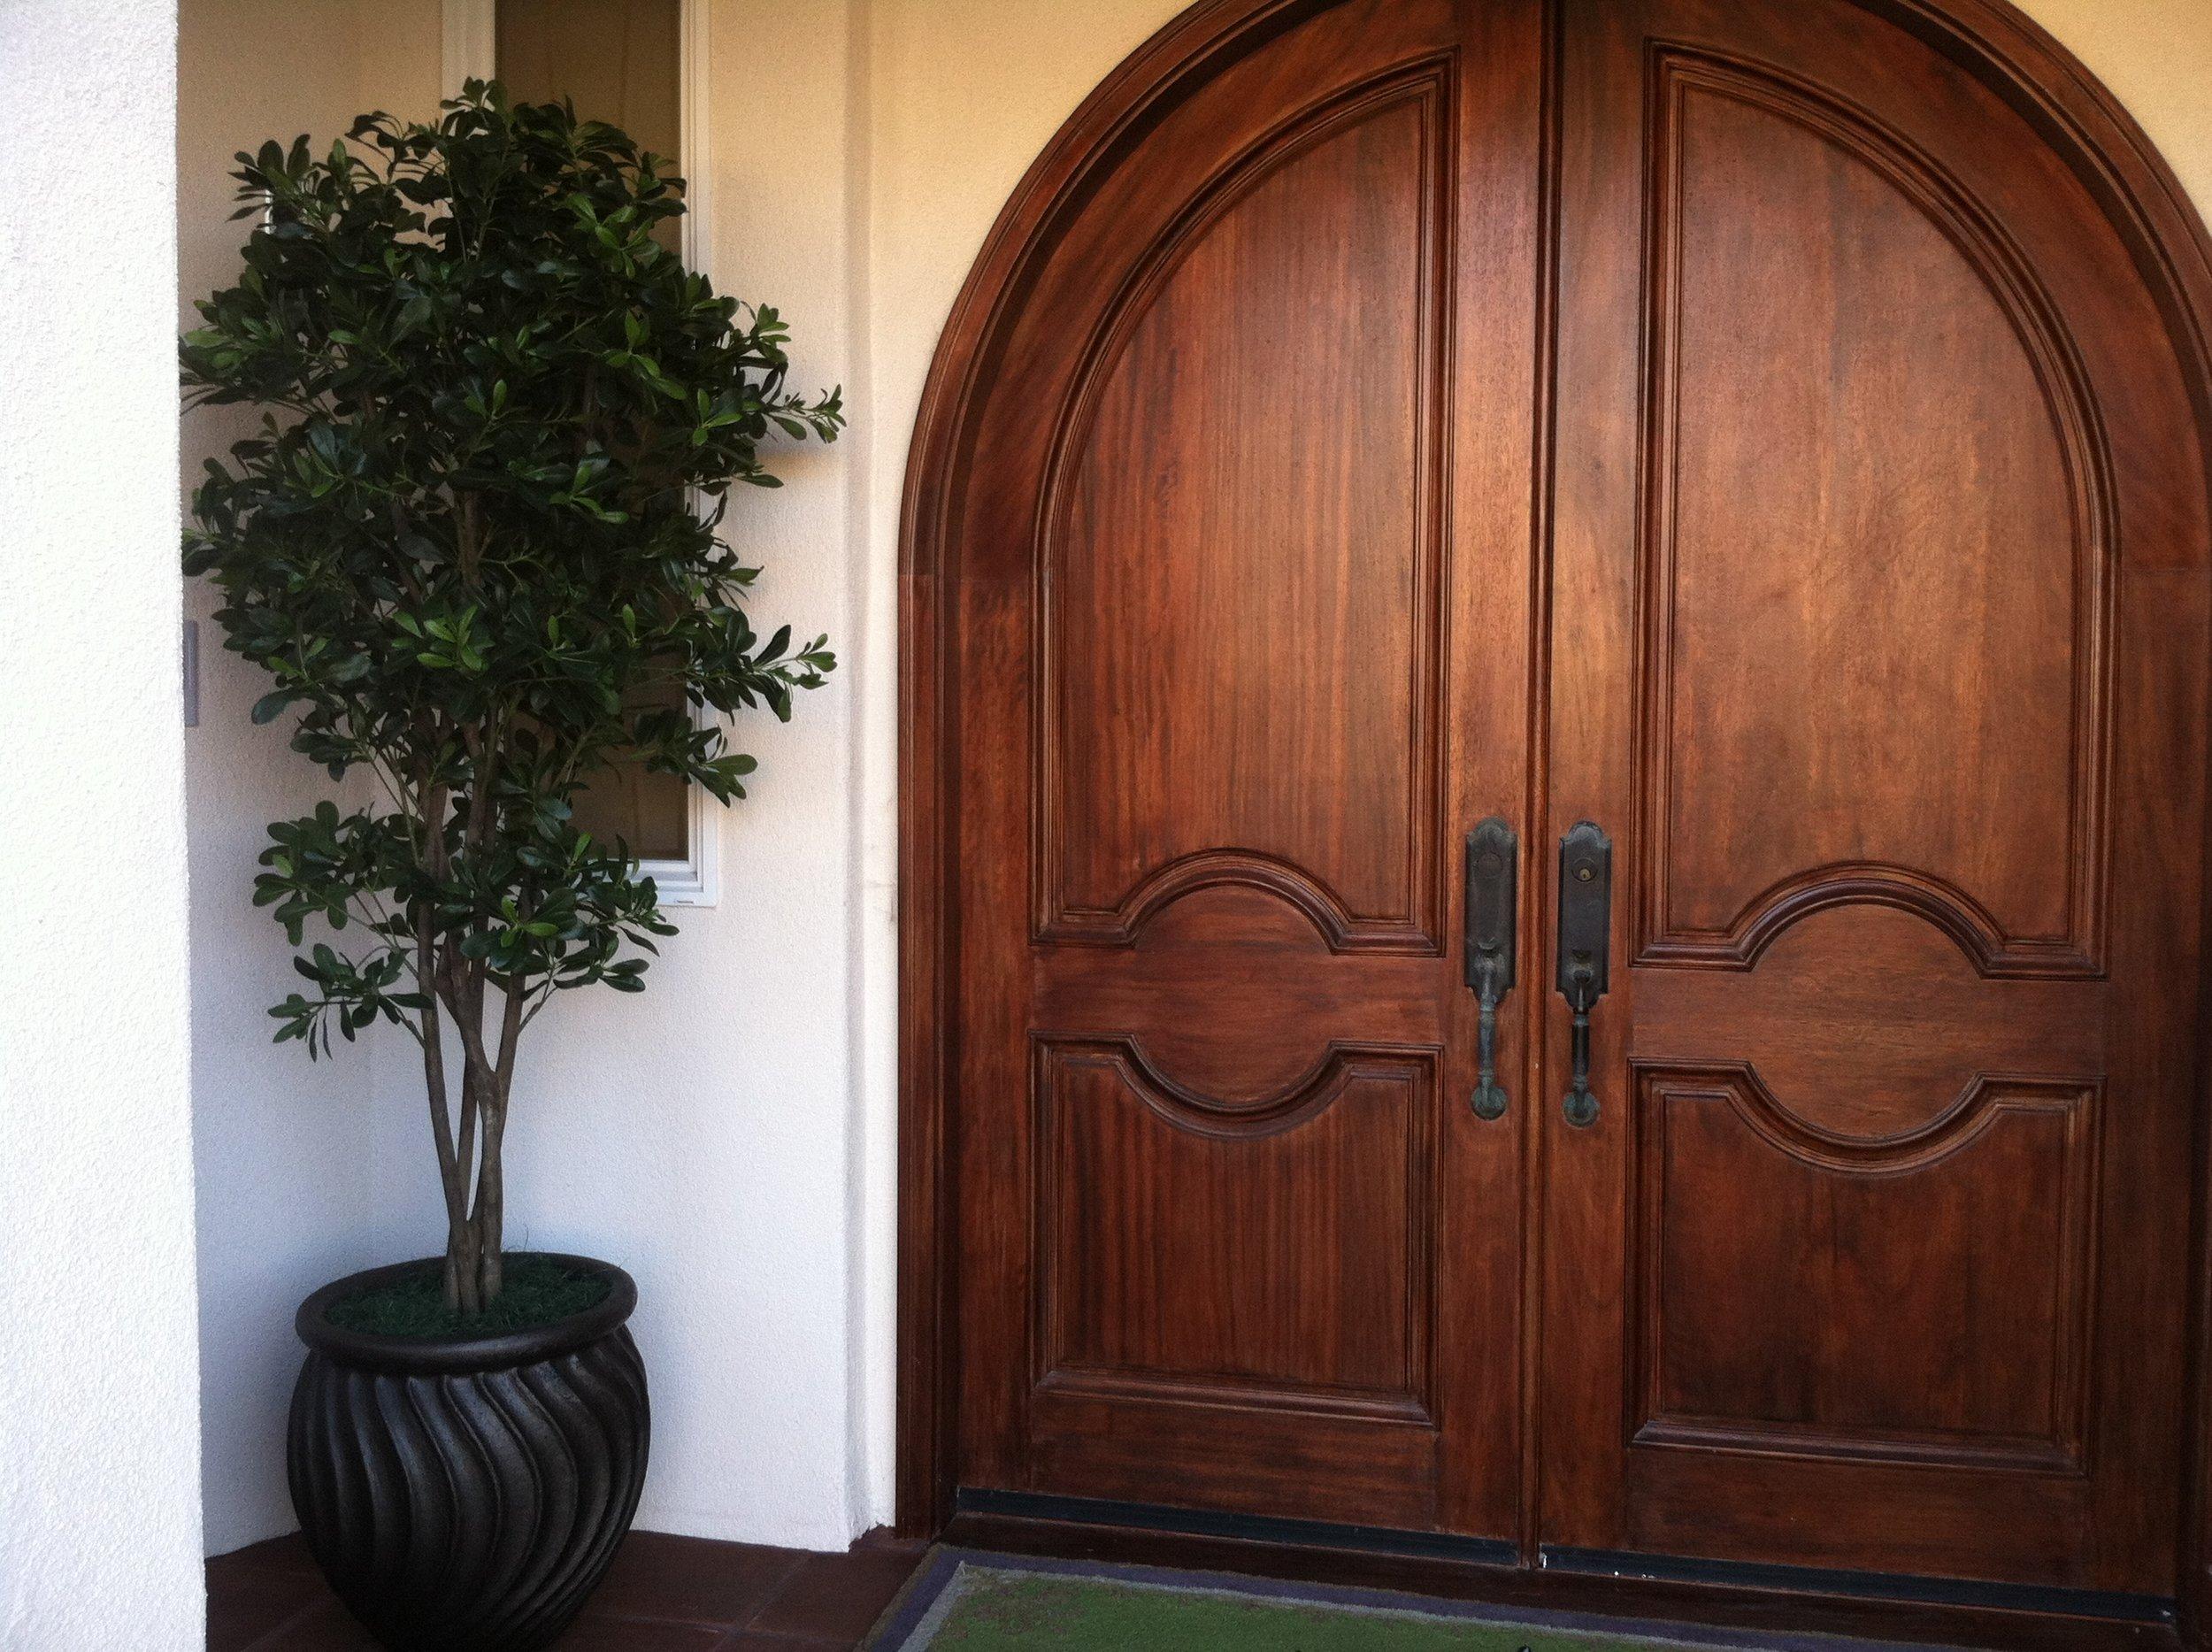 Private Residence - Replica tree